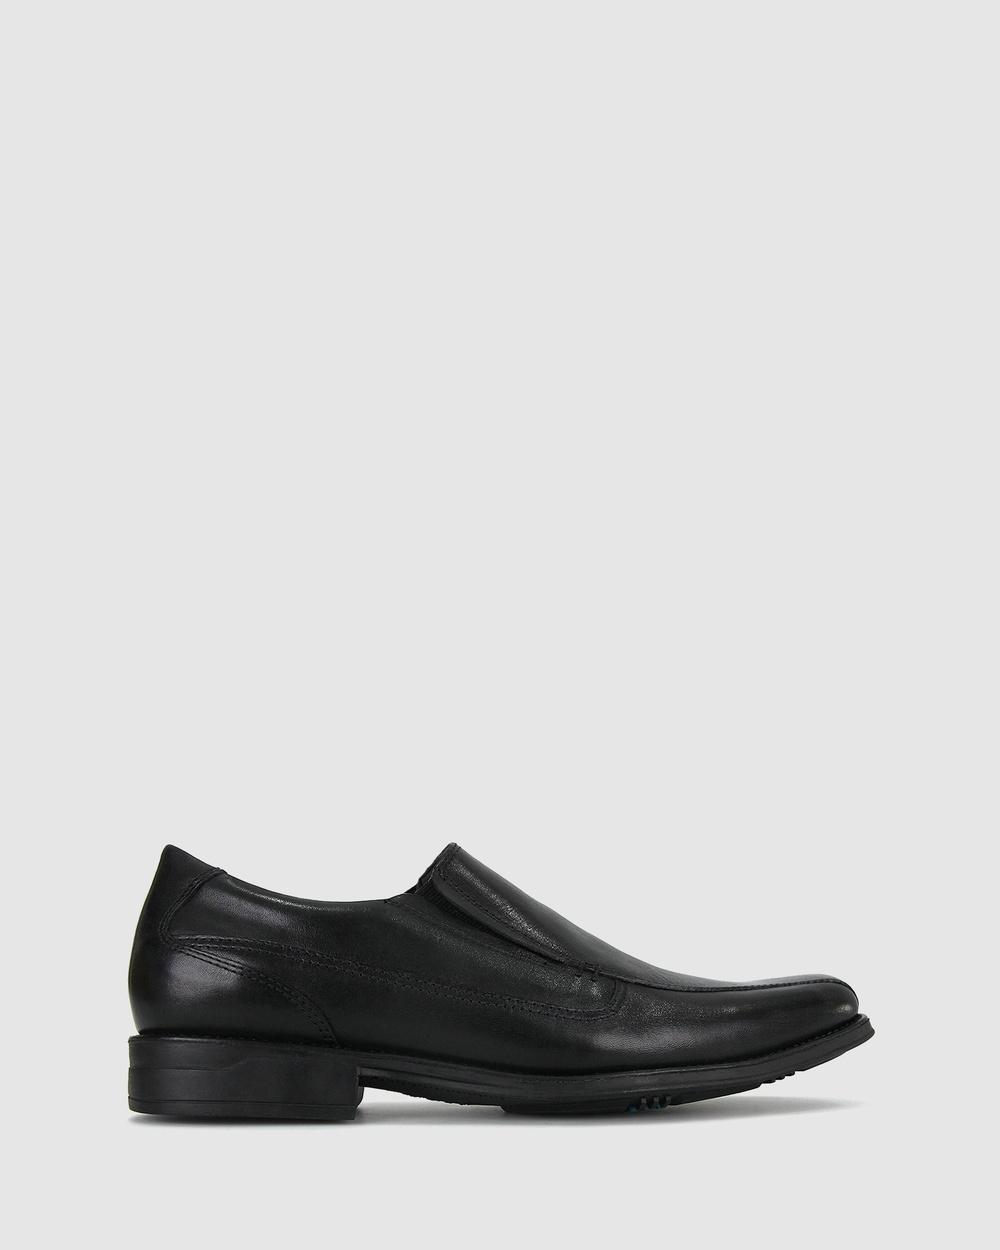 Airflex Carlos Slip On Dress Shoes Flats Black